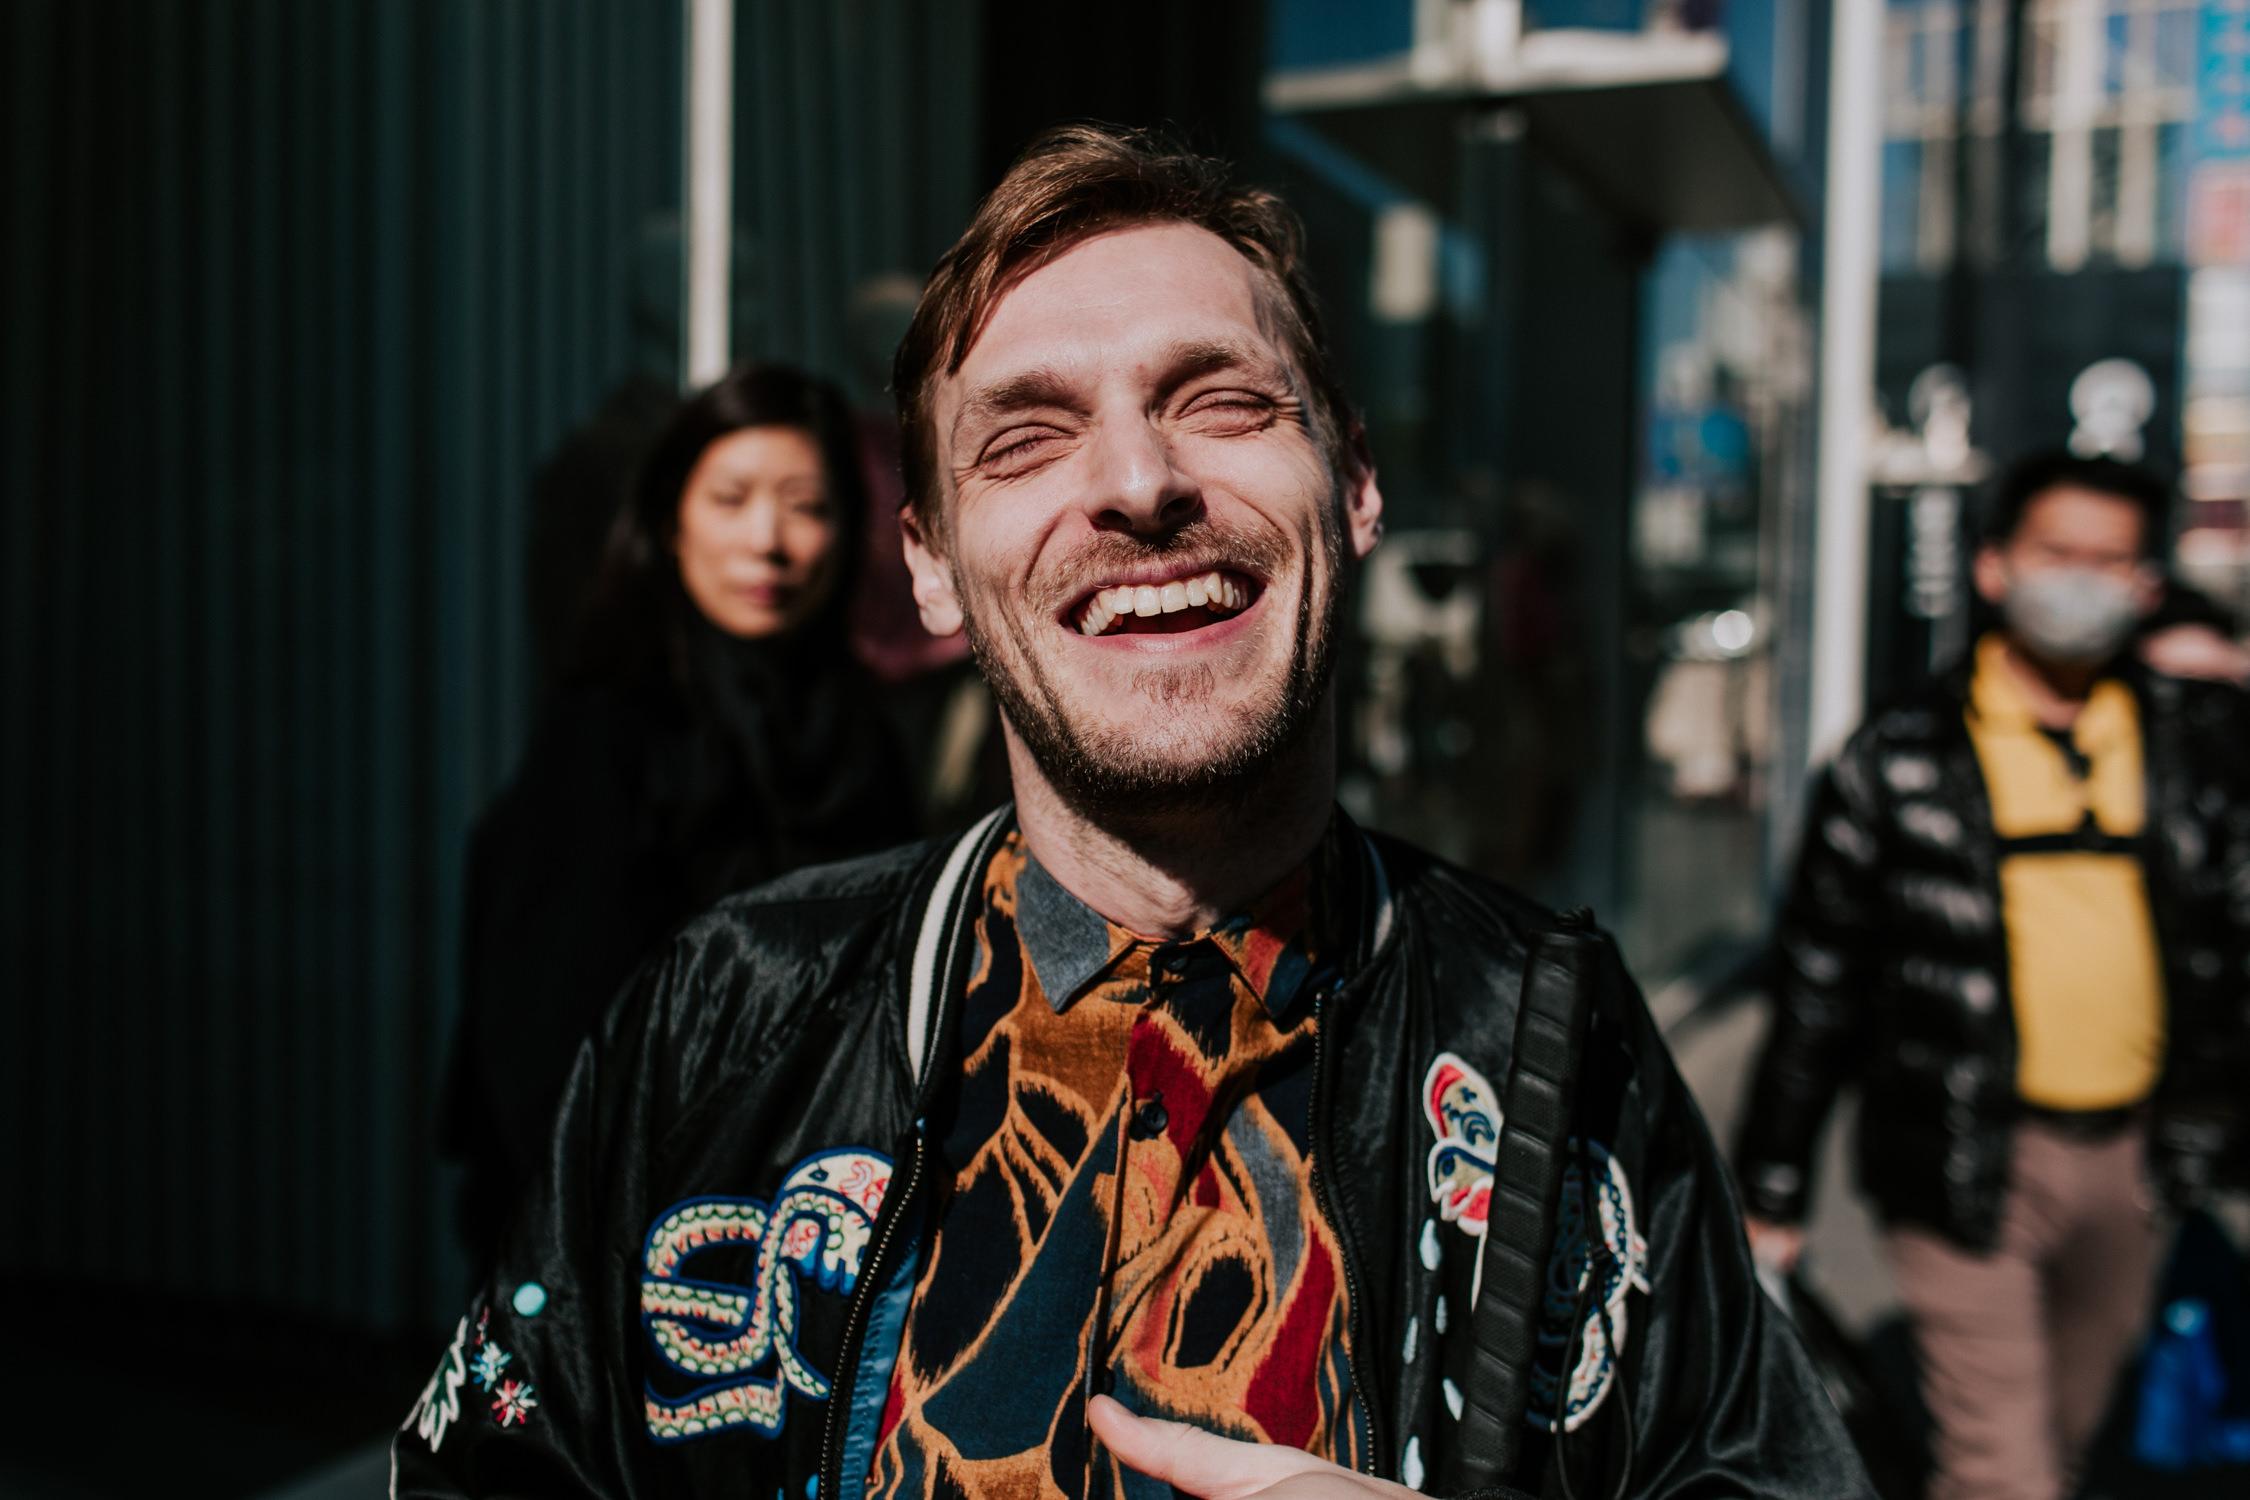 casey-harris-smiling-portrait-tour-AnnaLeeMedia